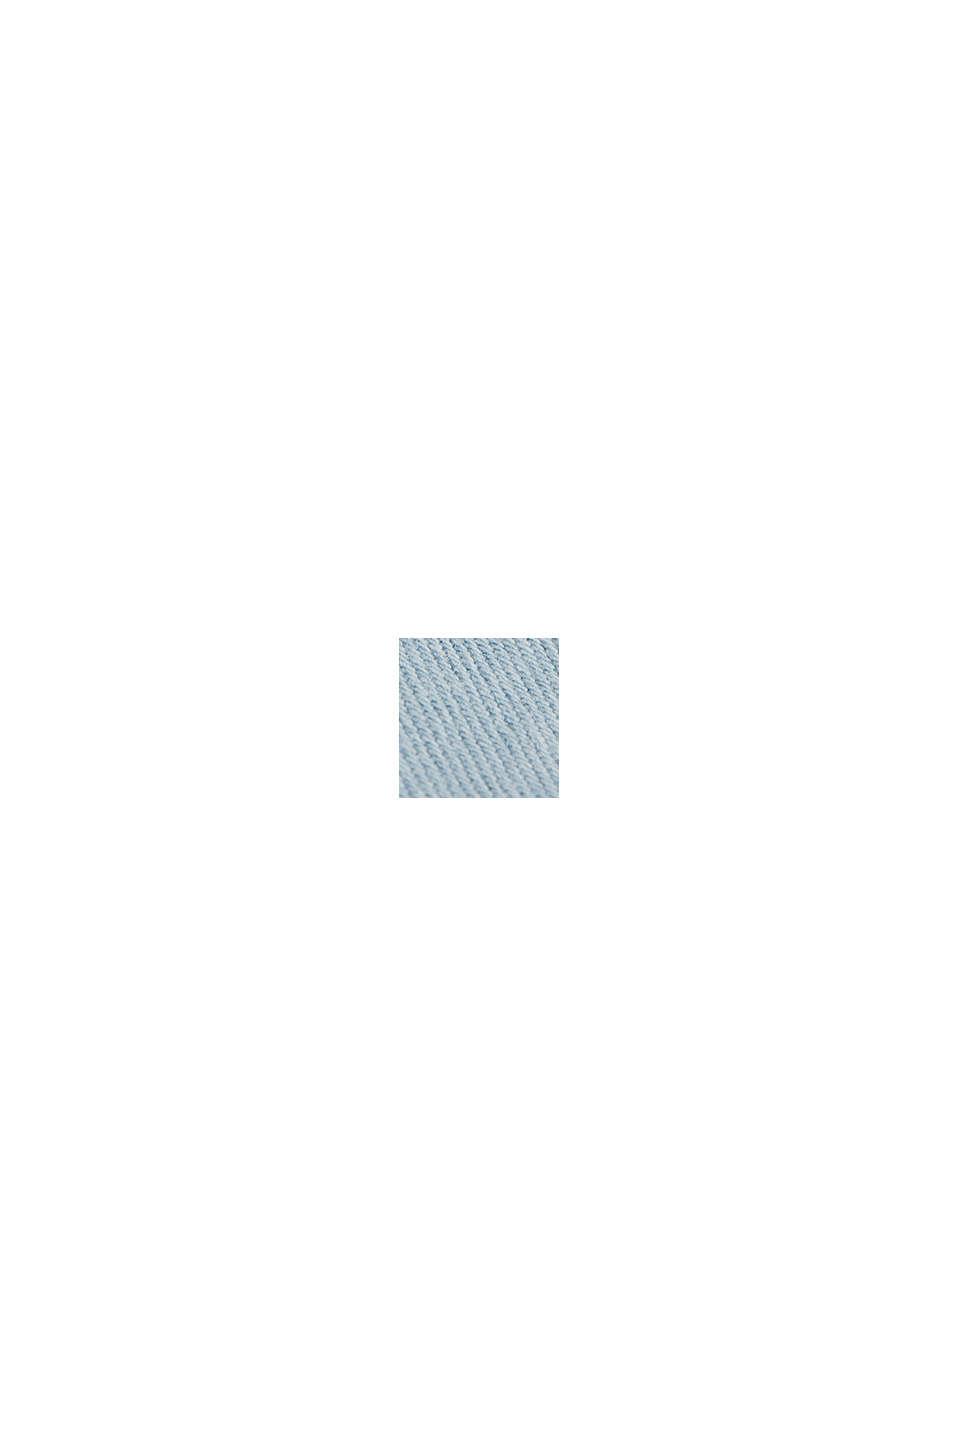 Jeansjacka med ekobomull, BLUE BLEACHED, swatch